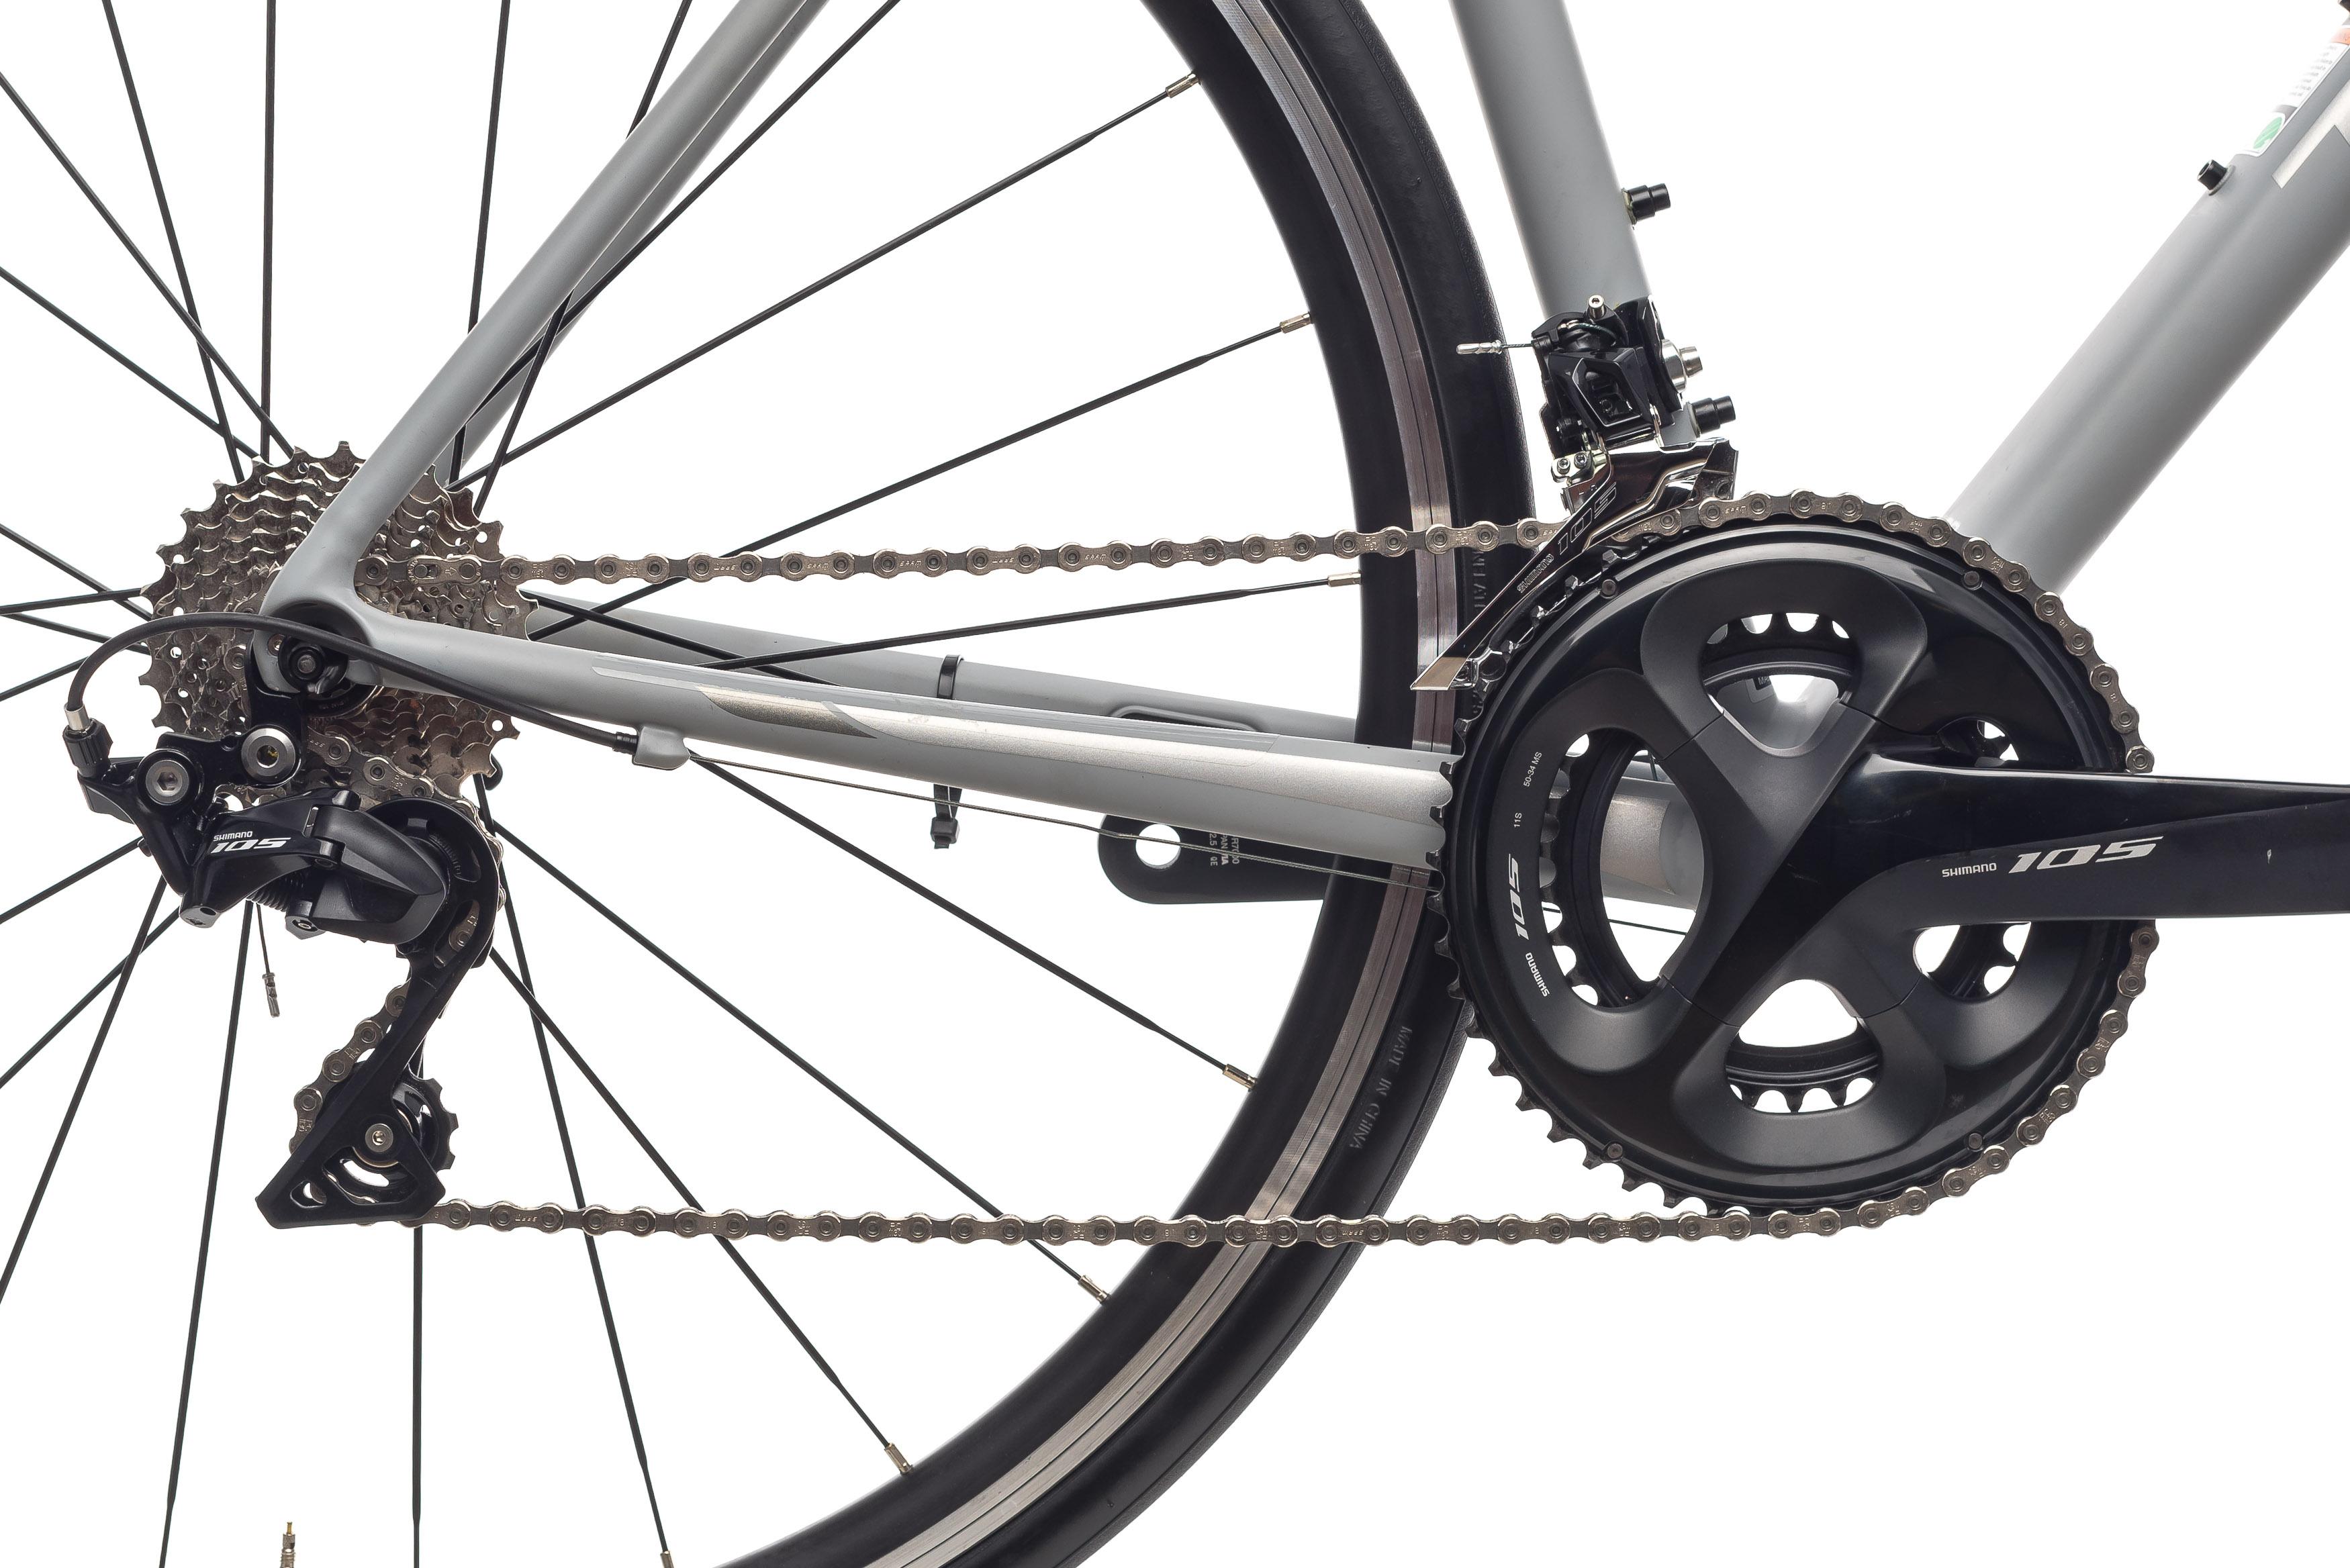 9ca9416ddba 2019 Trek Emonda ALR 5 Road Bike 54cm Aluminum Shimano 105 7000 11s  Bontrager